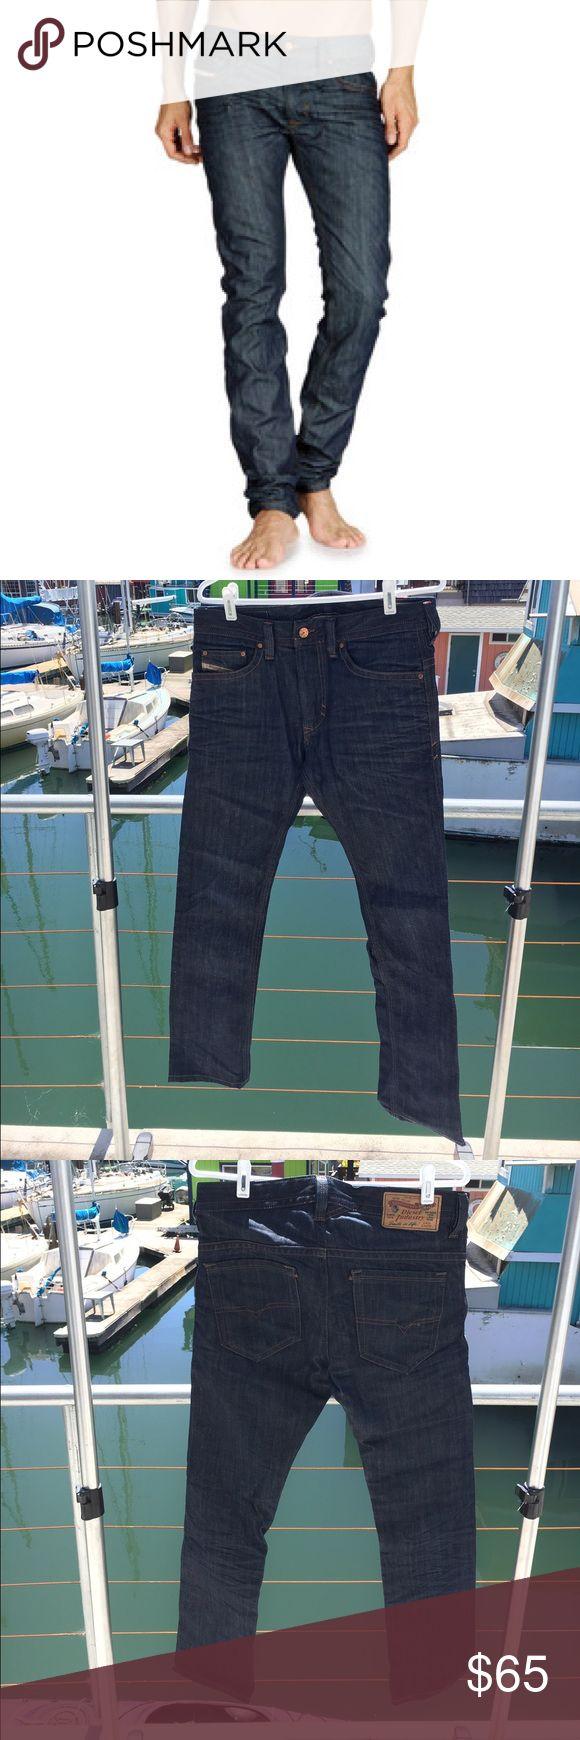 Diesel Denim Jeans Thavar slim-skinny cut W_28 L_32 Thavar cut  Wash 0880G     Excellent condition, aside from a small snag in stitching. Diesel Jeans Slim